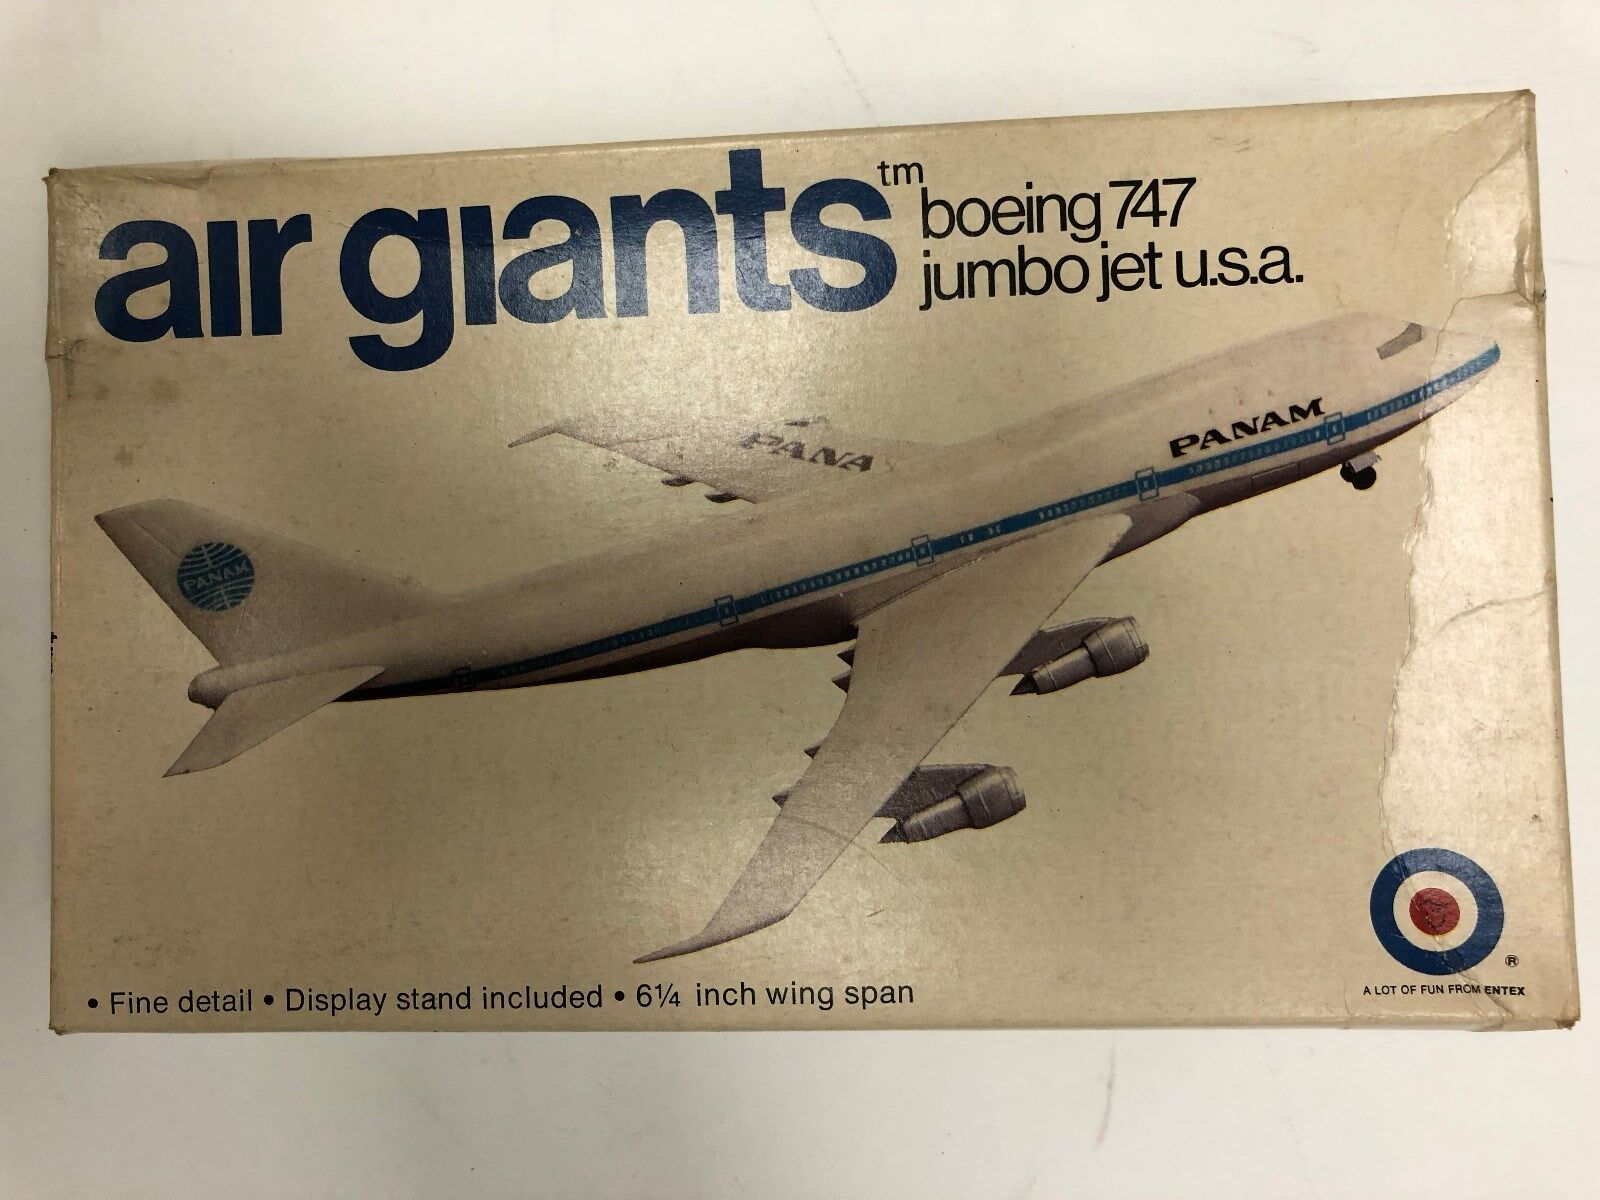 Air Giants,Boeing 747 jumbo jet, 1 380